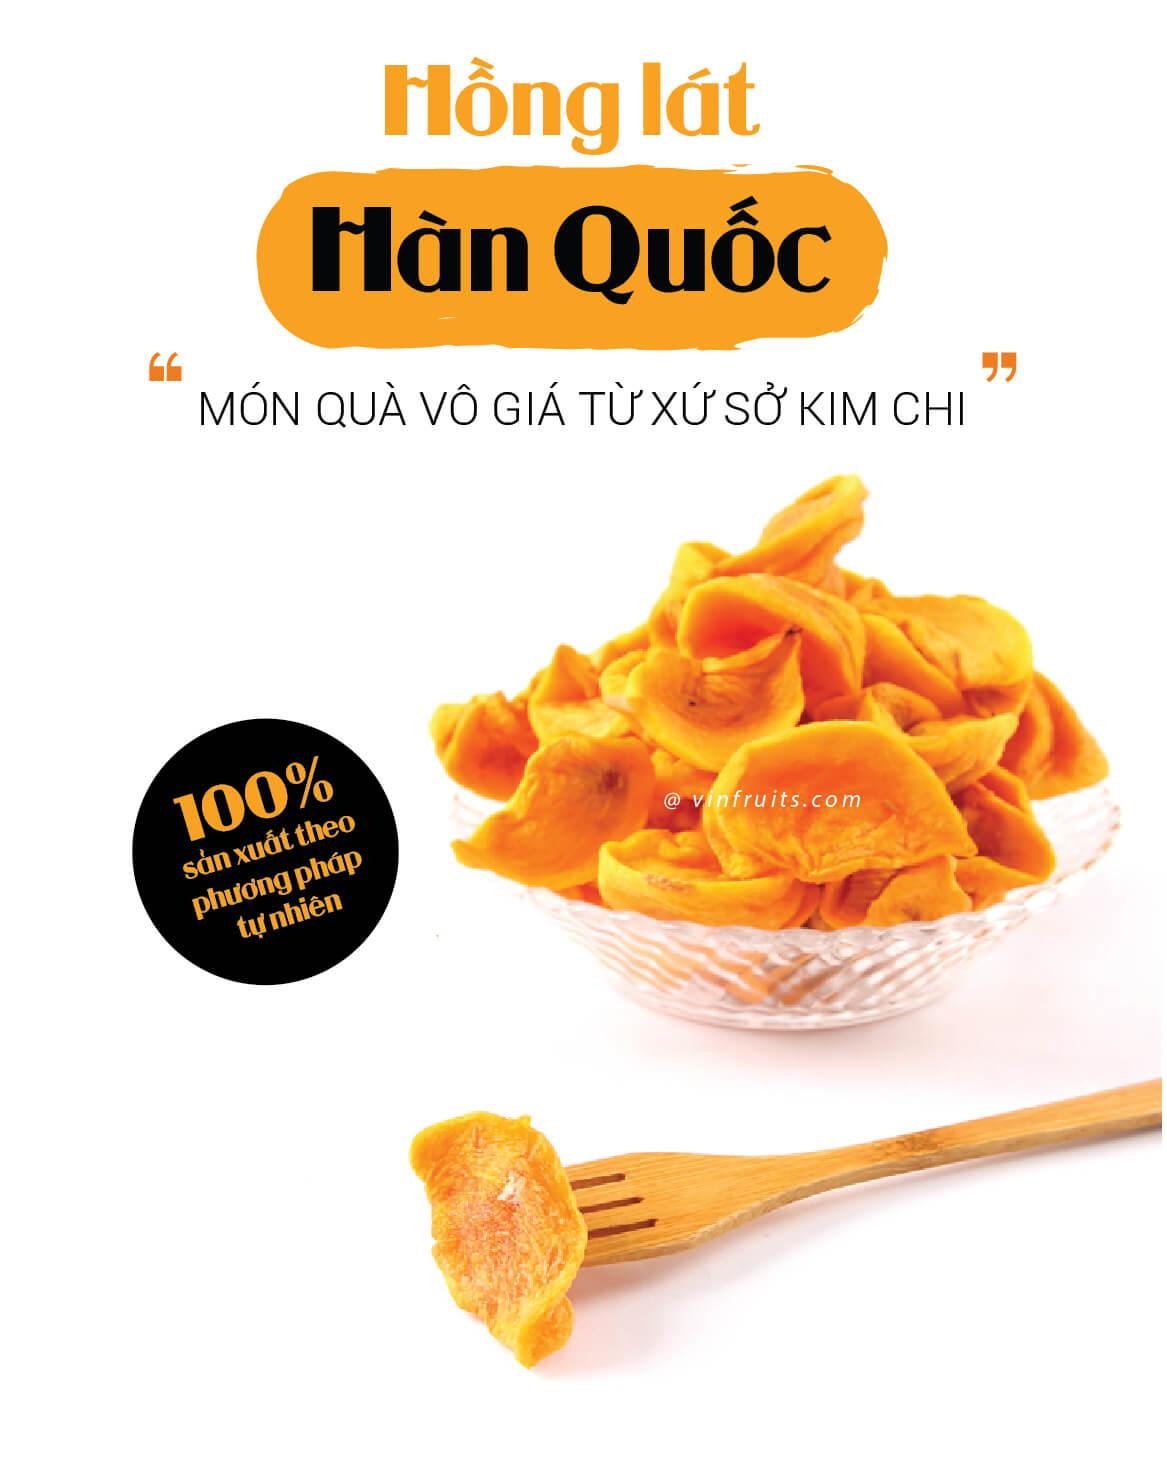 Hong lat mot nang Han Quoc - vinfrutis.com 2